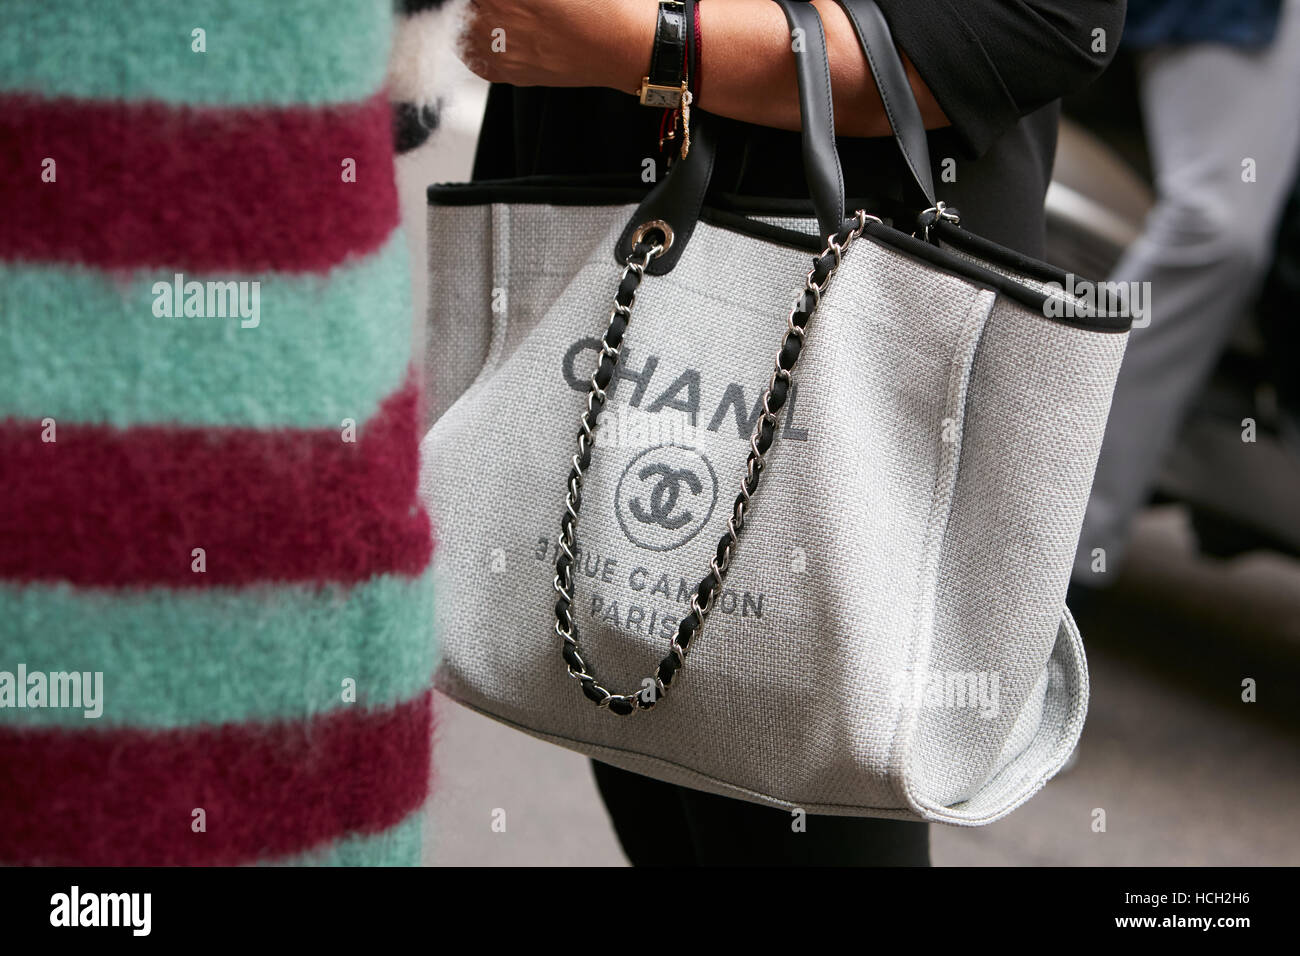 5dfe400f2574 Woman with Chanel canvas bag before Max Mara fashion show